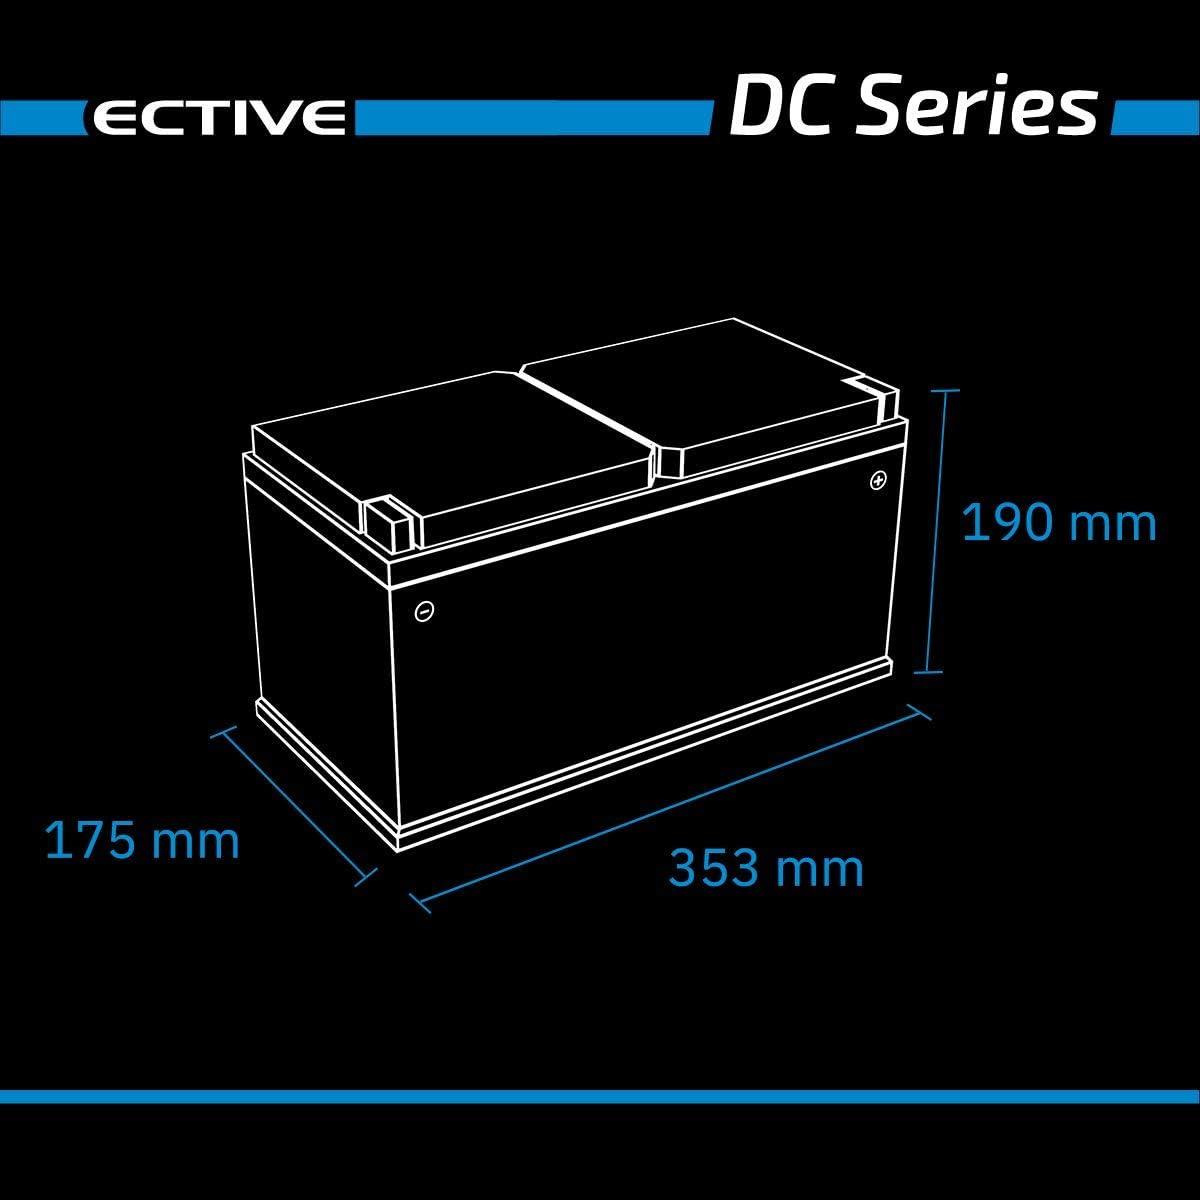 Ective 95ah 12v Gel Versorgungsbatterie Dc 95 Deep Cycle Solar Batterie Vrla Zyklenfest In 2 Varianten Wartungsfrei Auto